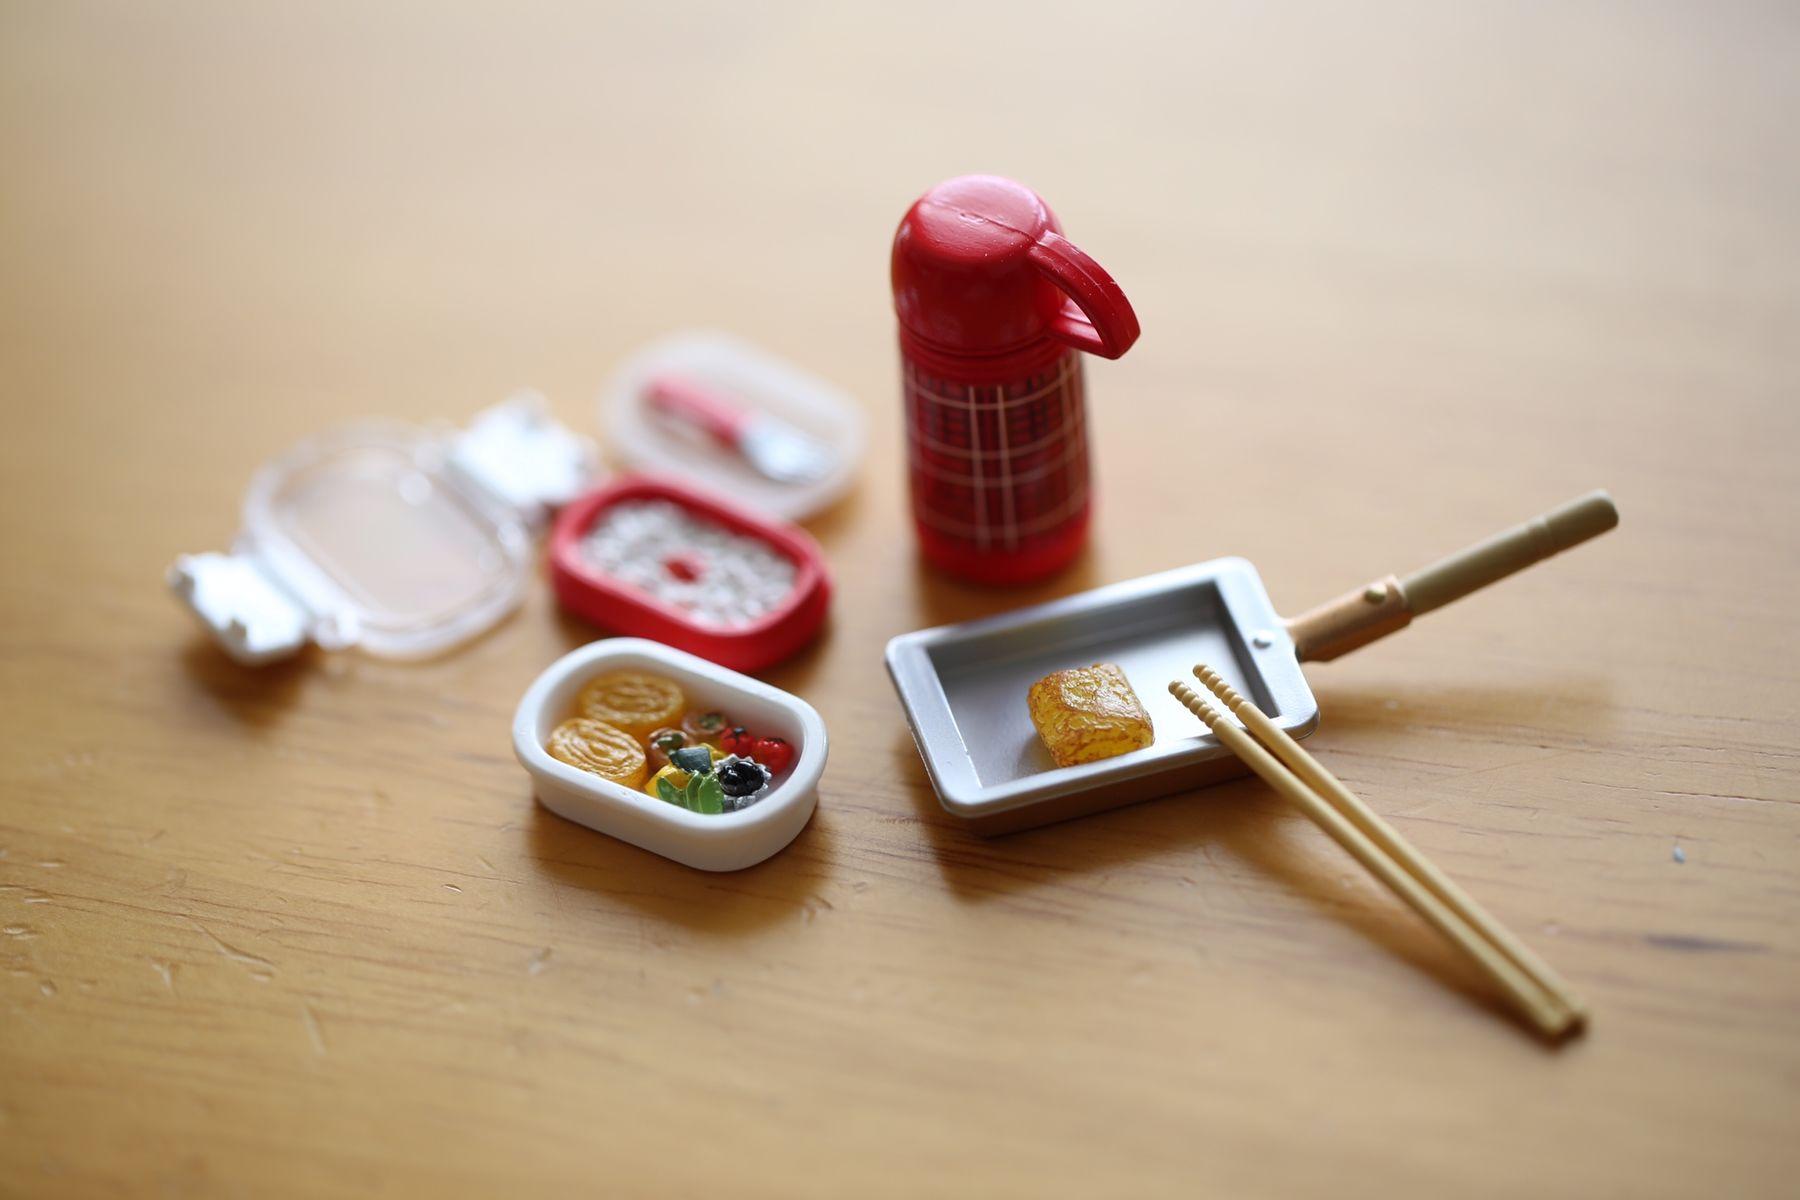 Cooking Miniature おべんとう たまご焼き 水筒 アラジン 菜箸 和食 Lunch